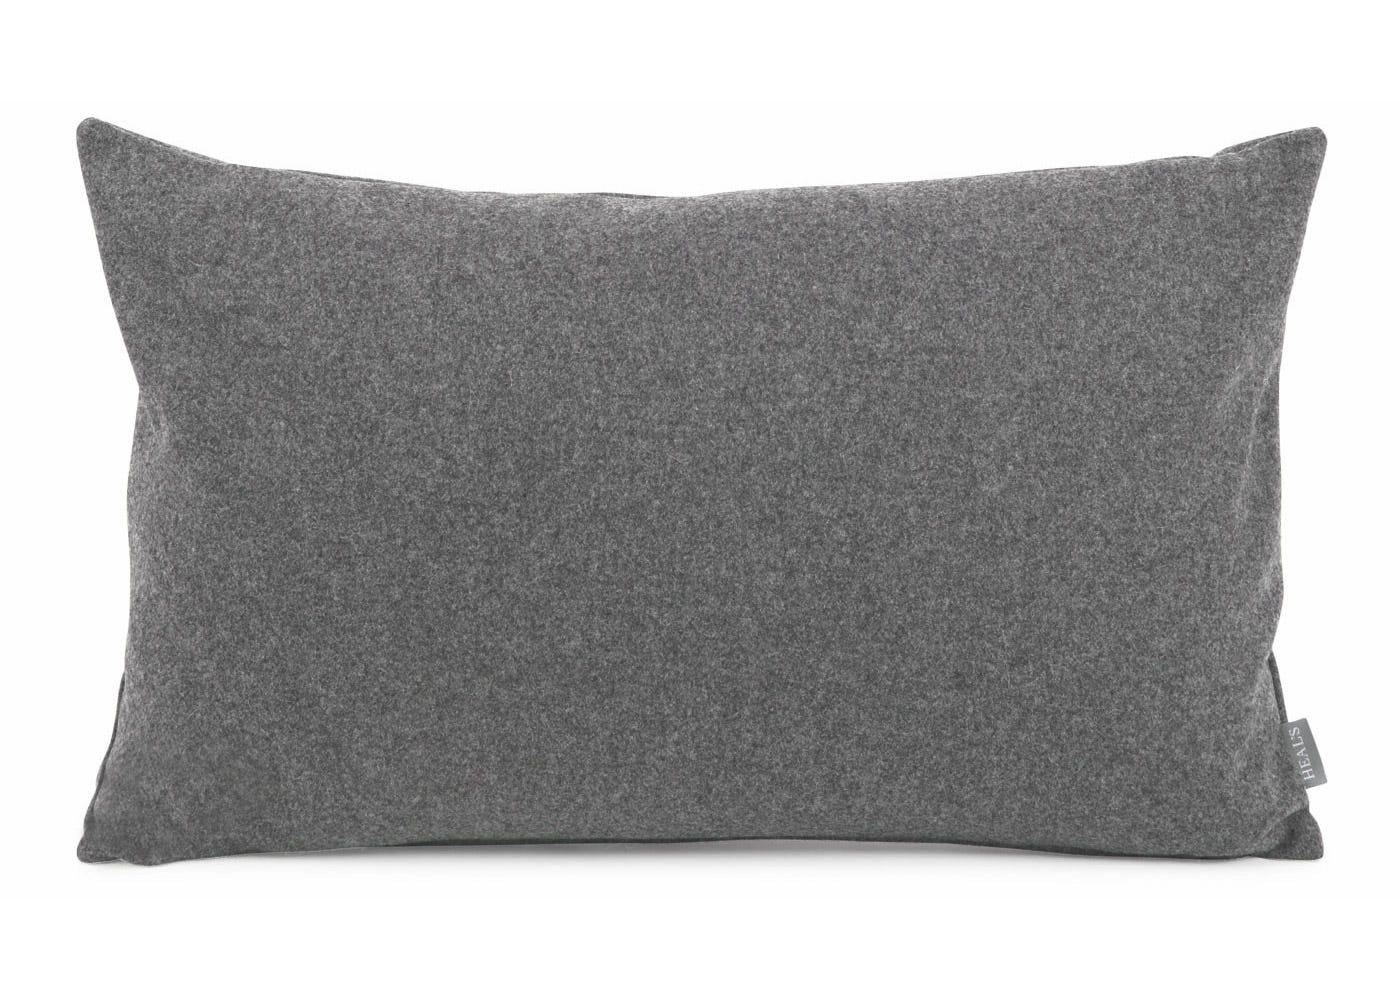 Islington Wool Cushion Slate 35 x 55cm